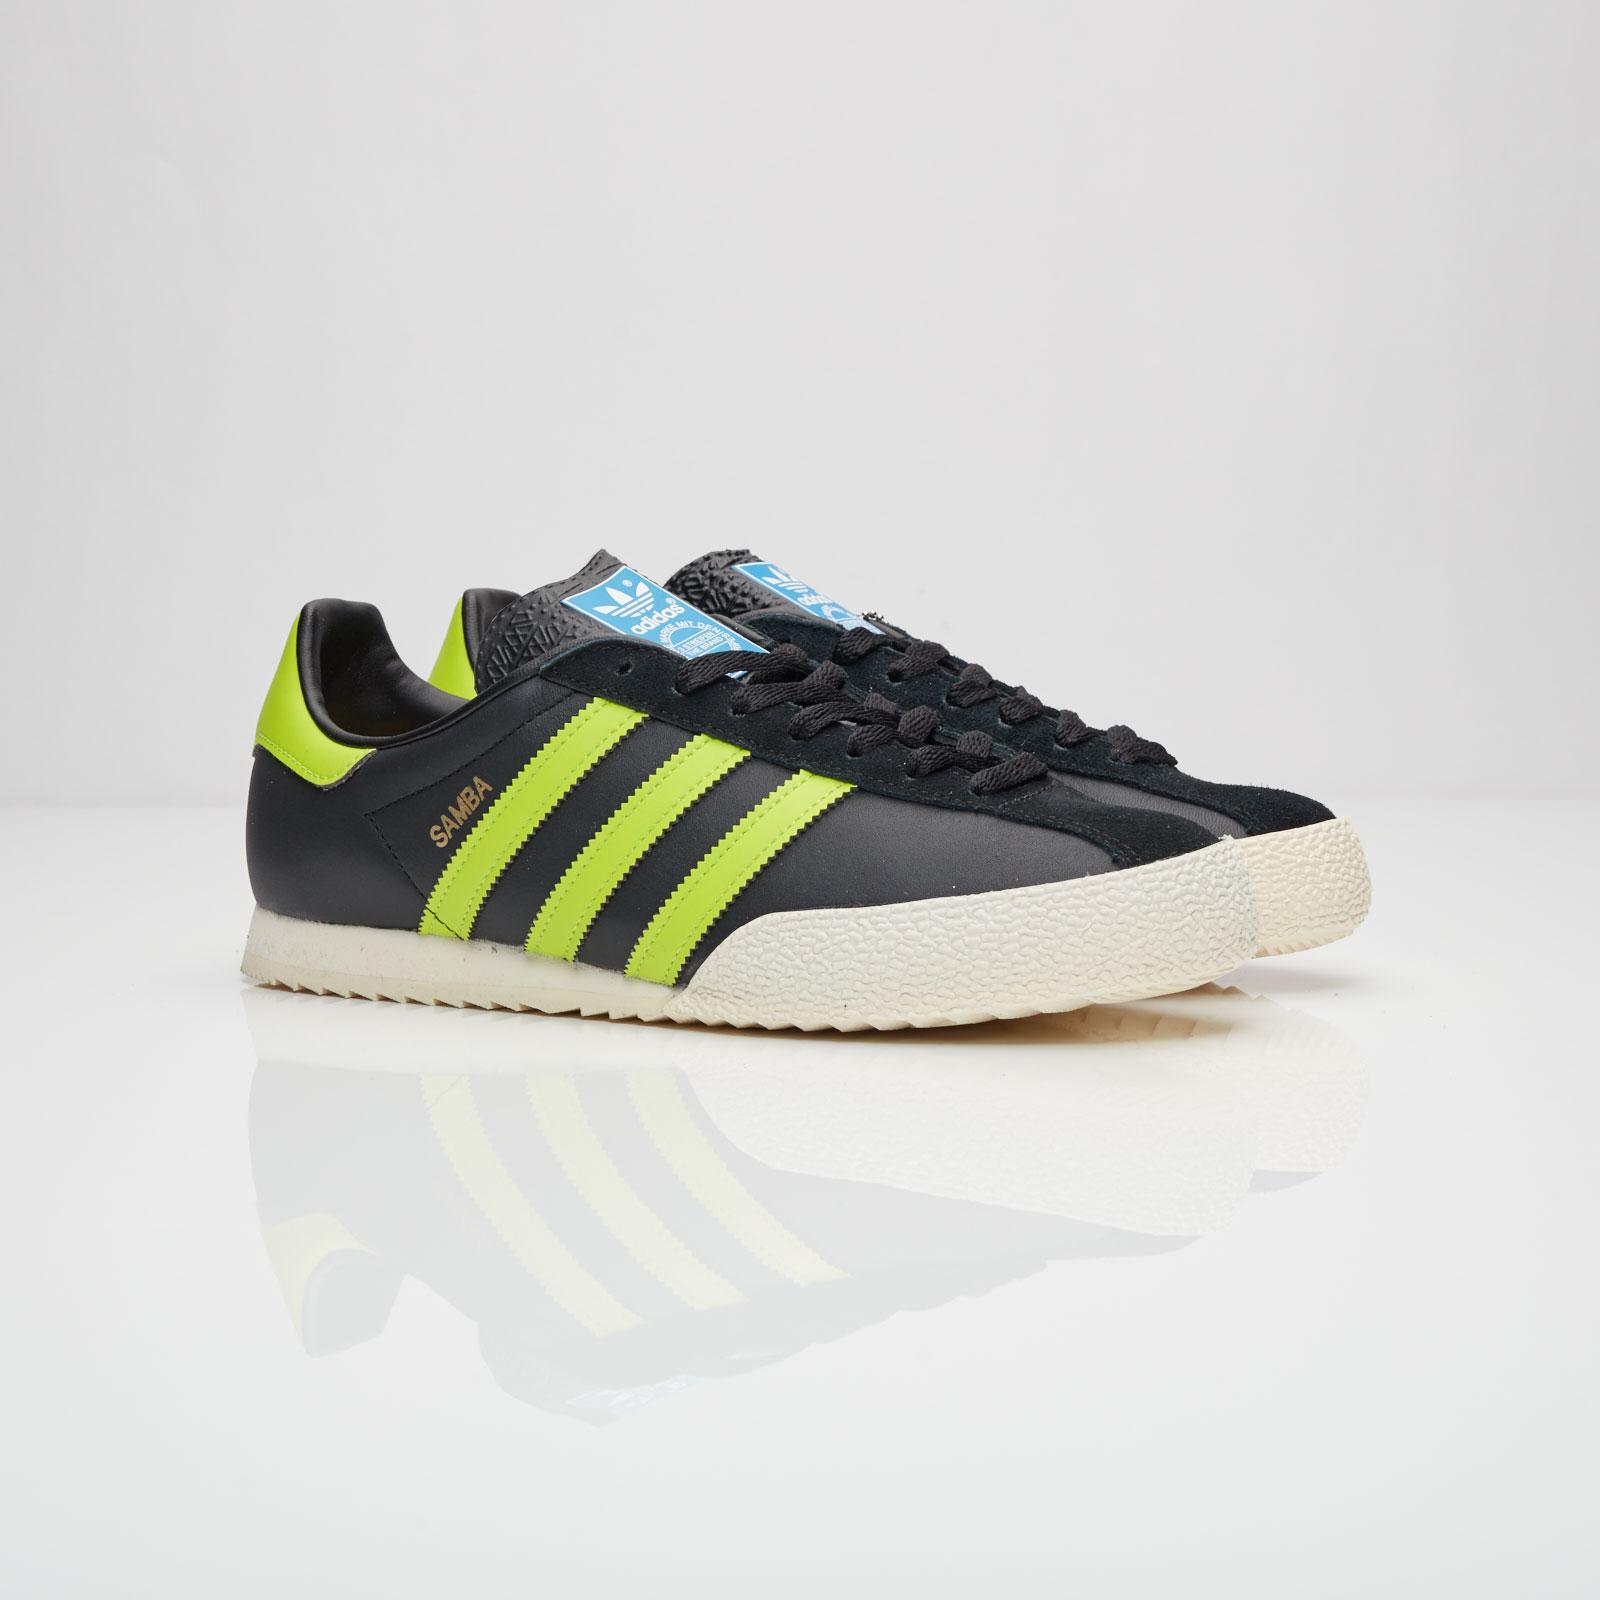 ca1c1d630a039 adidas Samba SPZL - S75958 - Sneakersnstuff | sneakers & streetwear ...